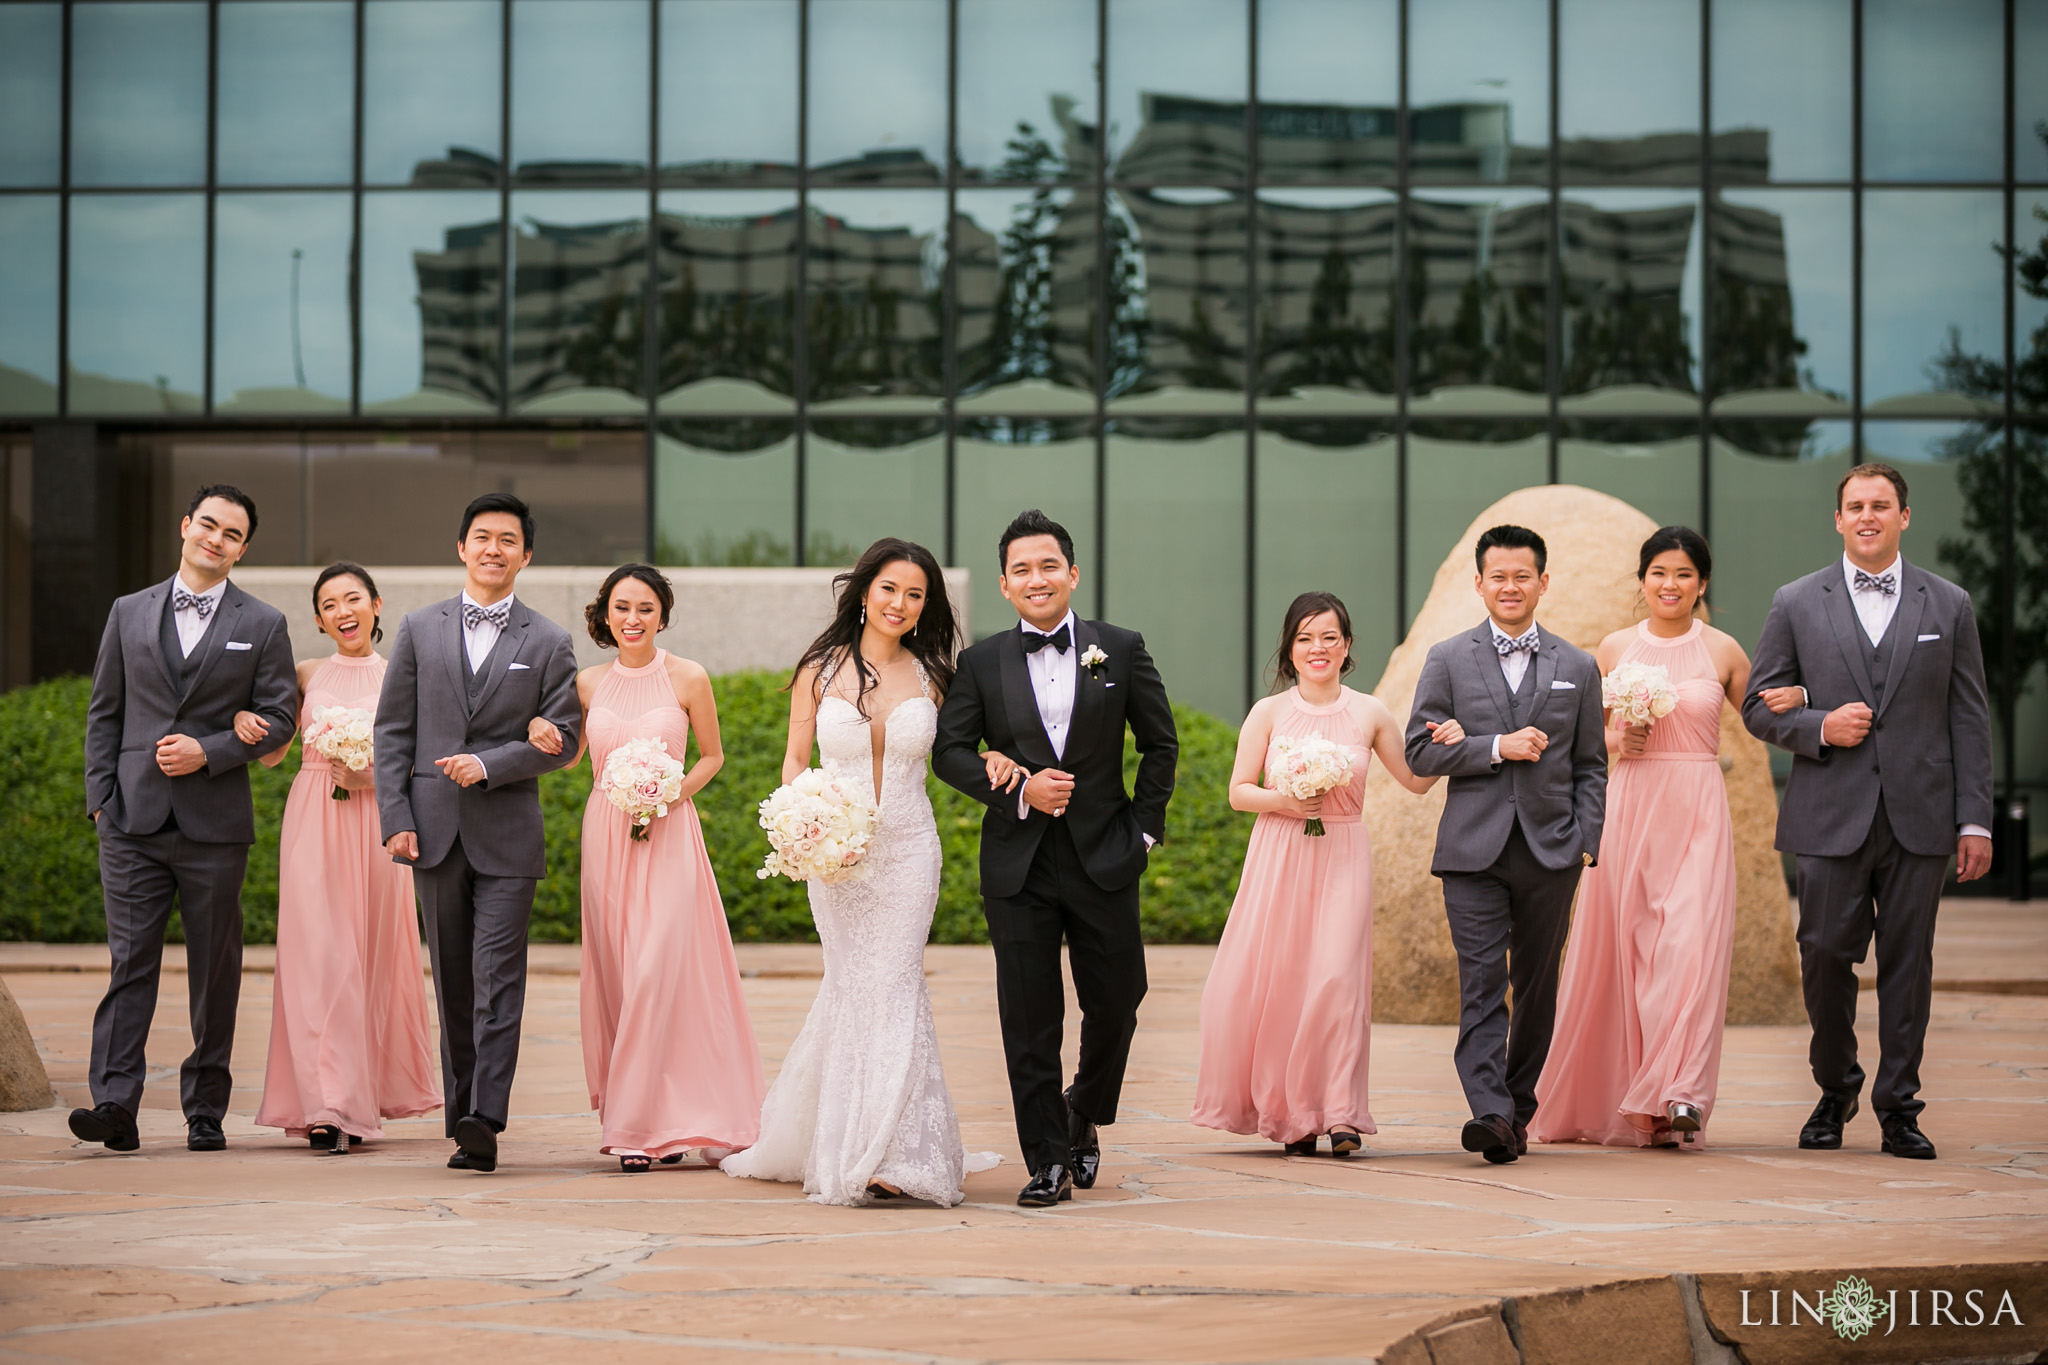 021 hilton costa mesa orange county vietnamese wedding photography